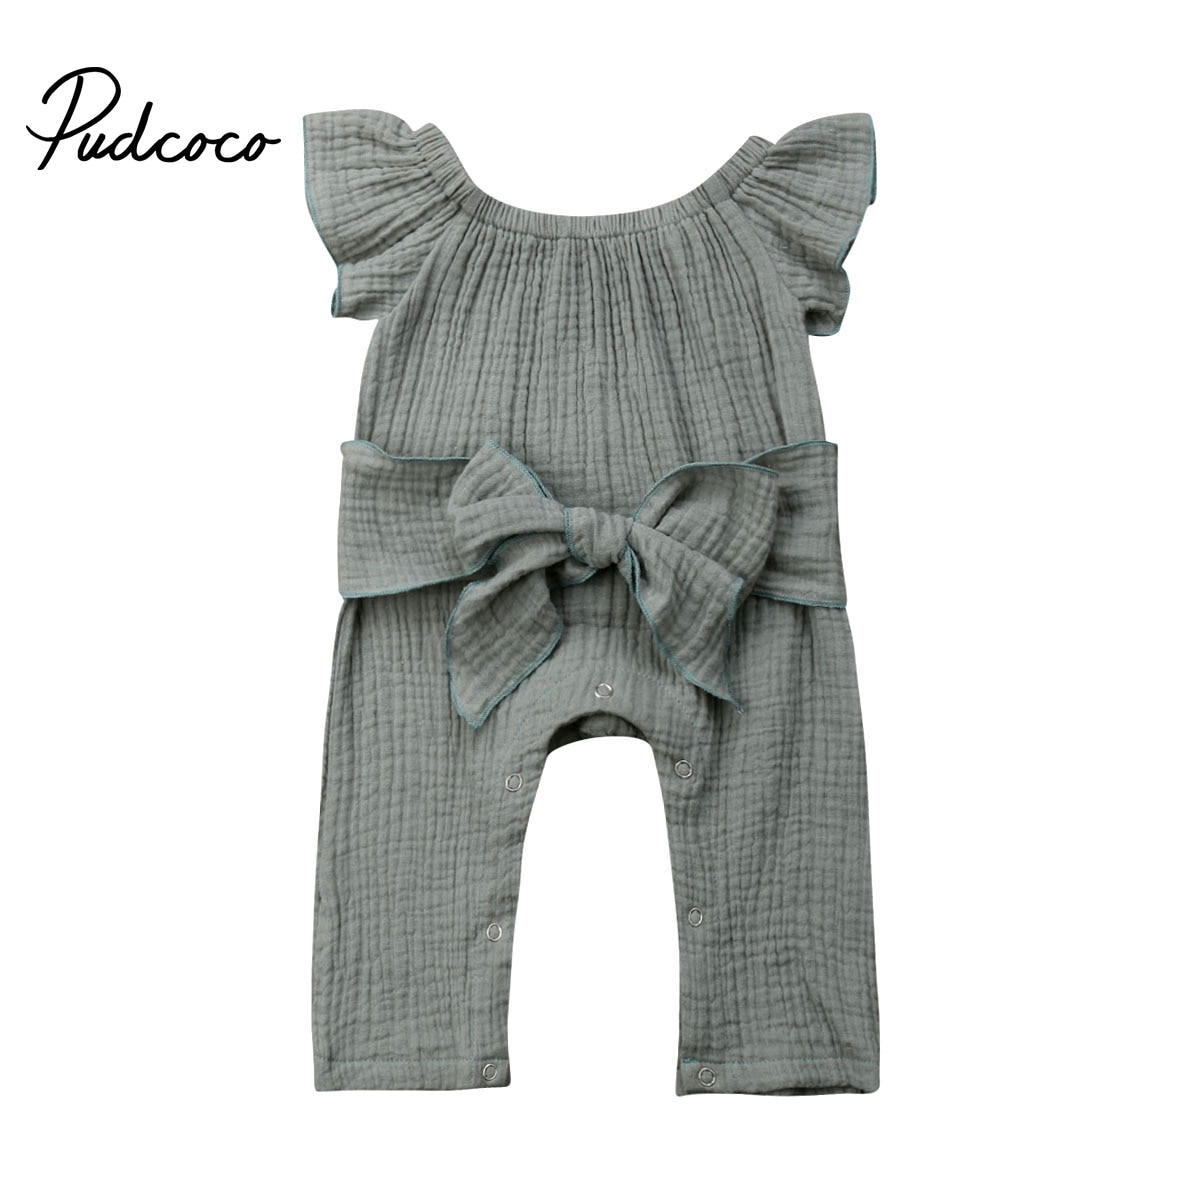 2020 moda verano recién nacido chico s bebé algodón Niña ropa Boho sin mangas mameluco para niño mono trajes Sunsuit 0-24M